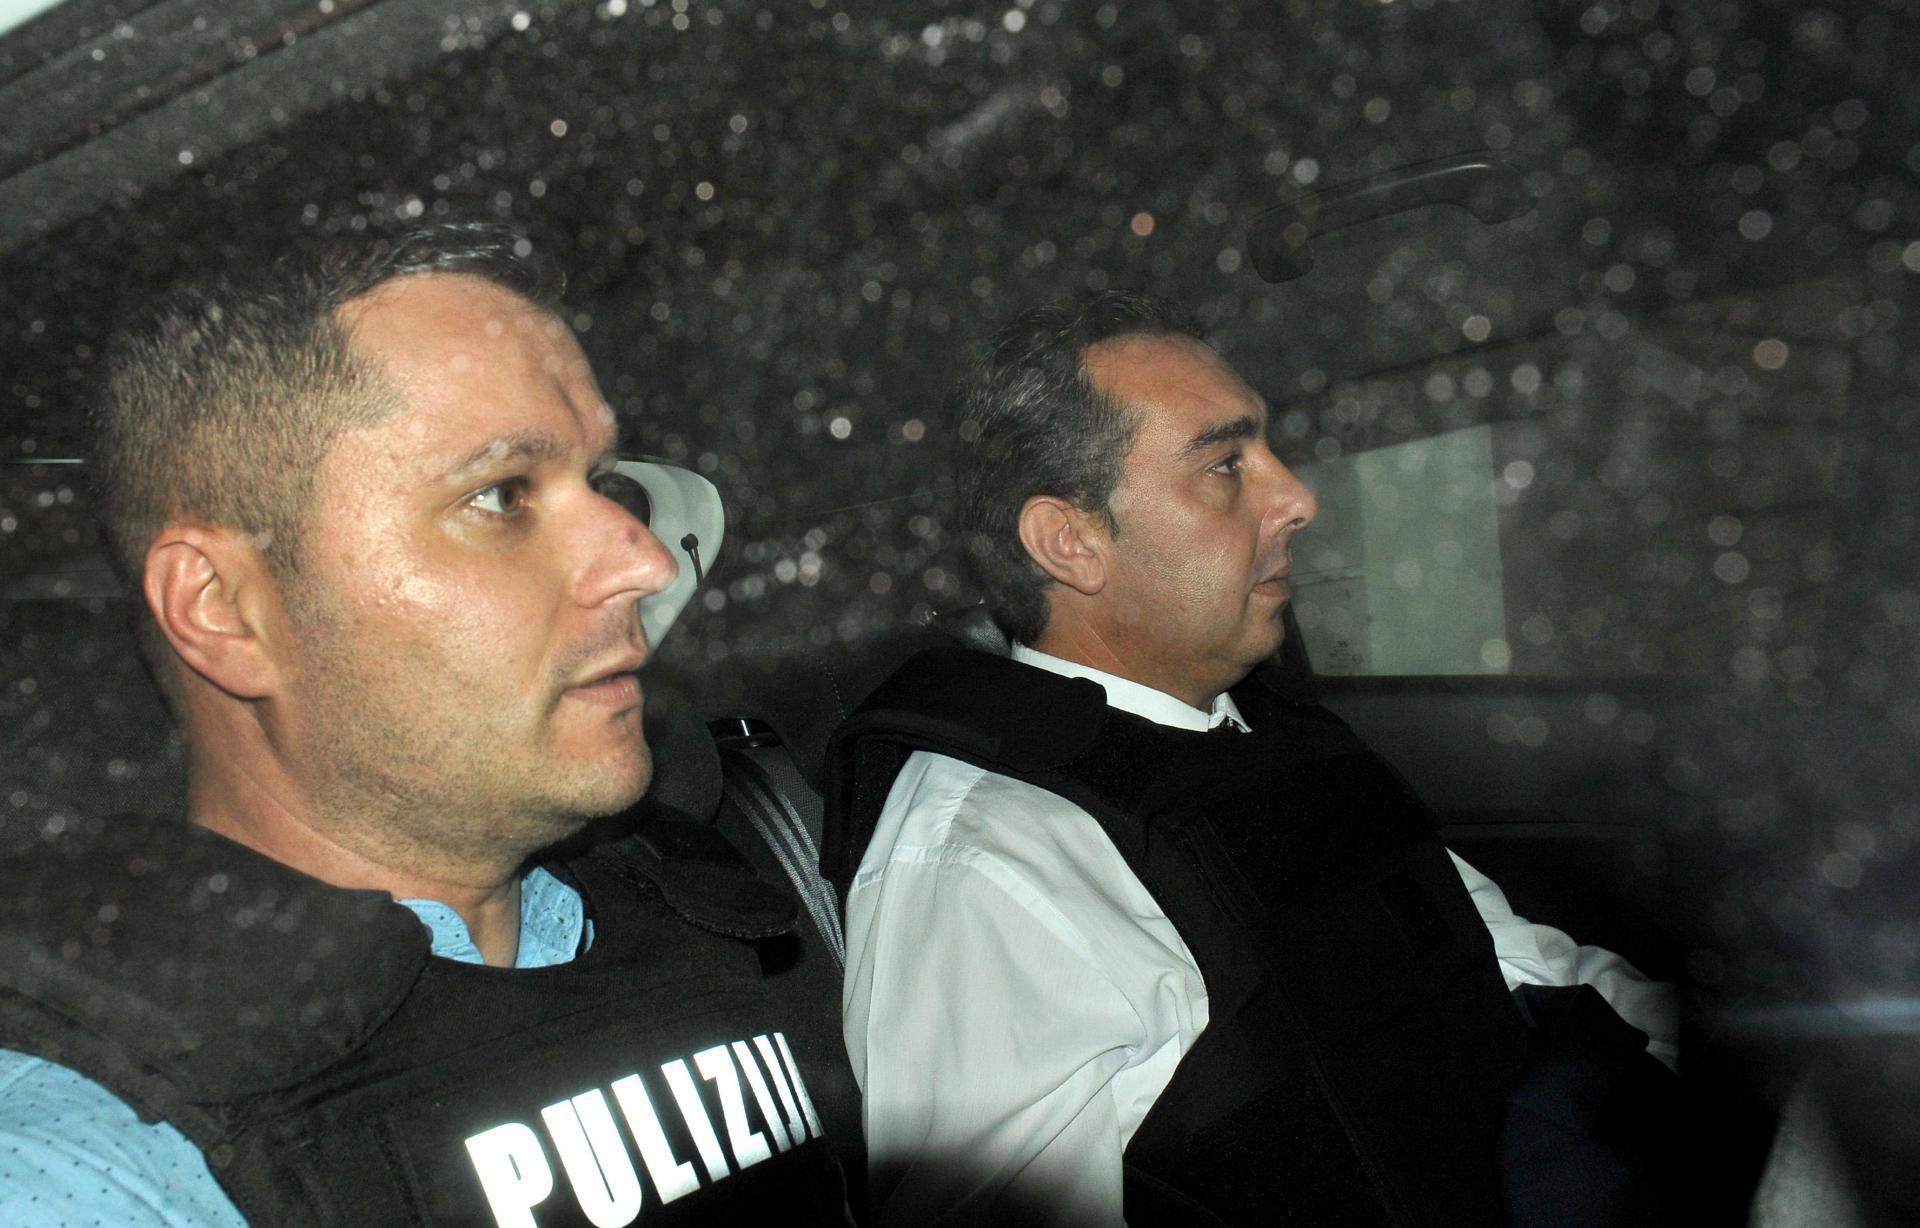 Melvin Theuma was arrested on November 14.